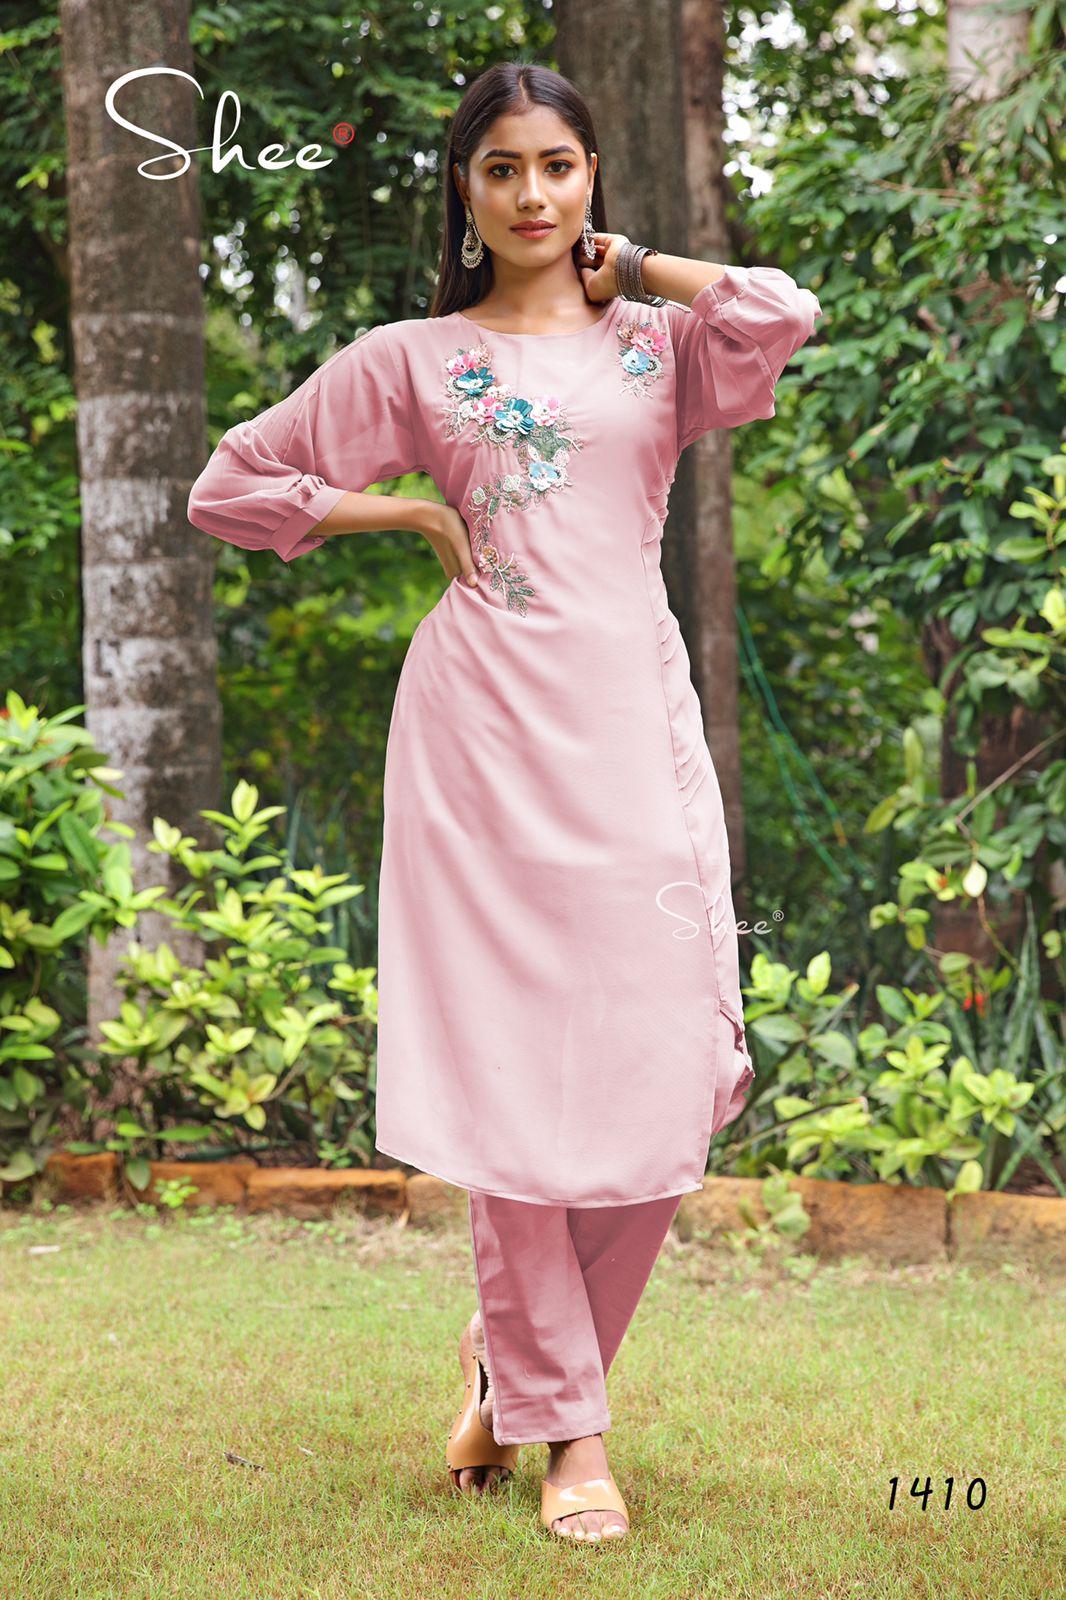 Shee Design No 1410 Size Set Kurtis Pant Set Catalog Lowest Price